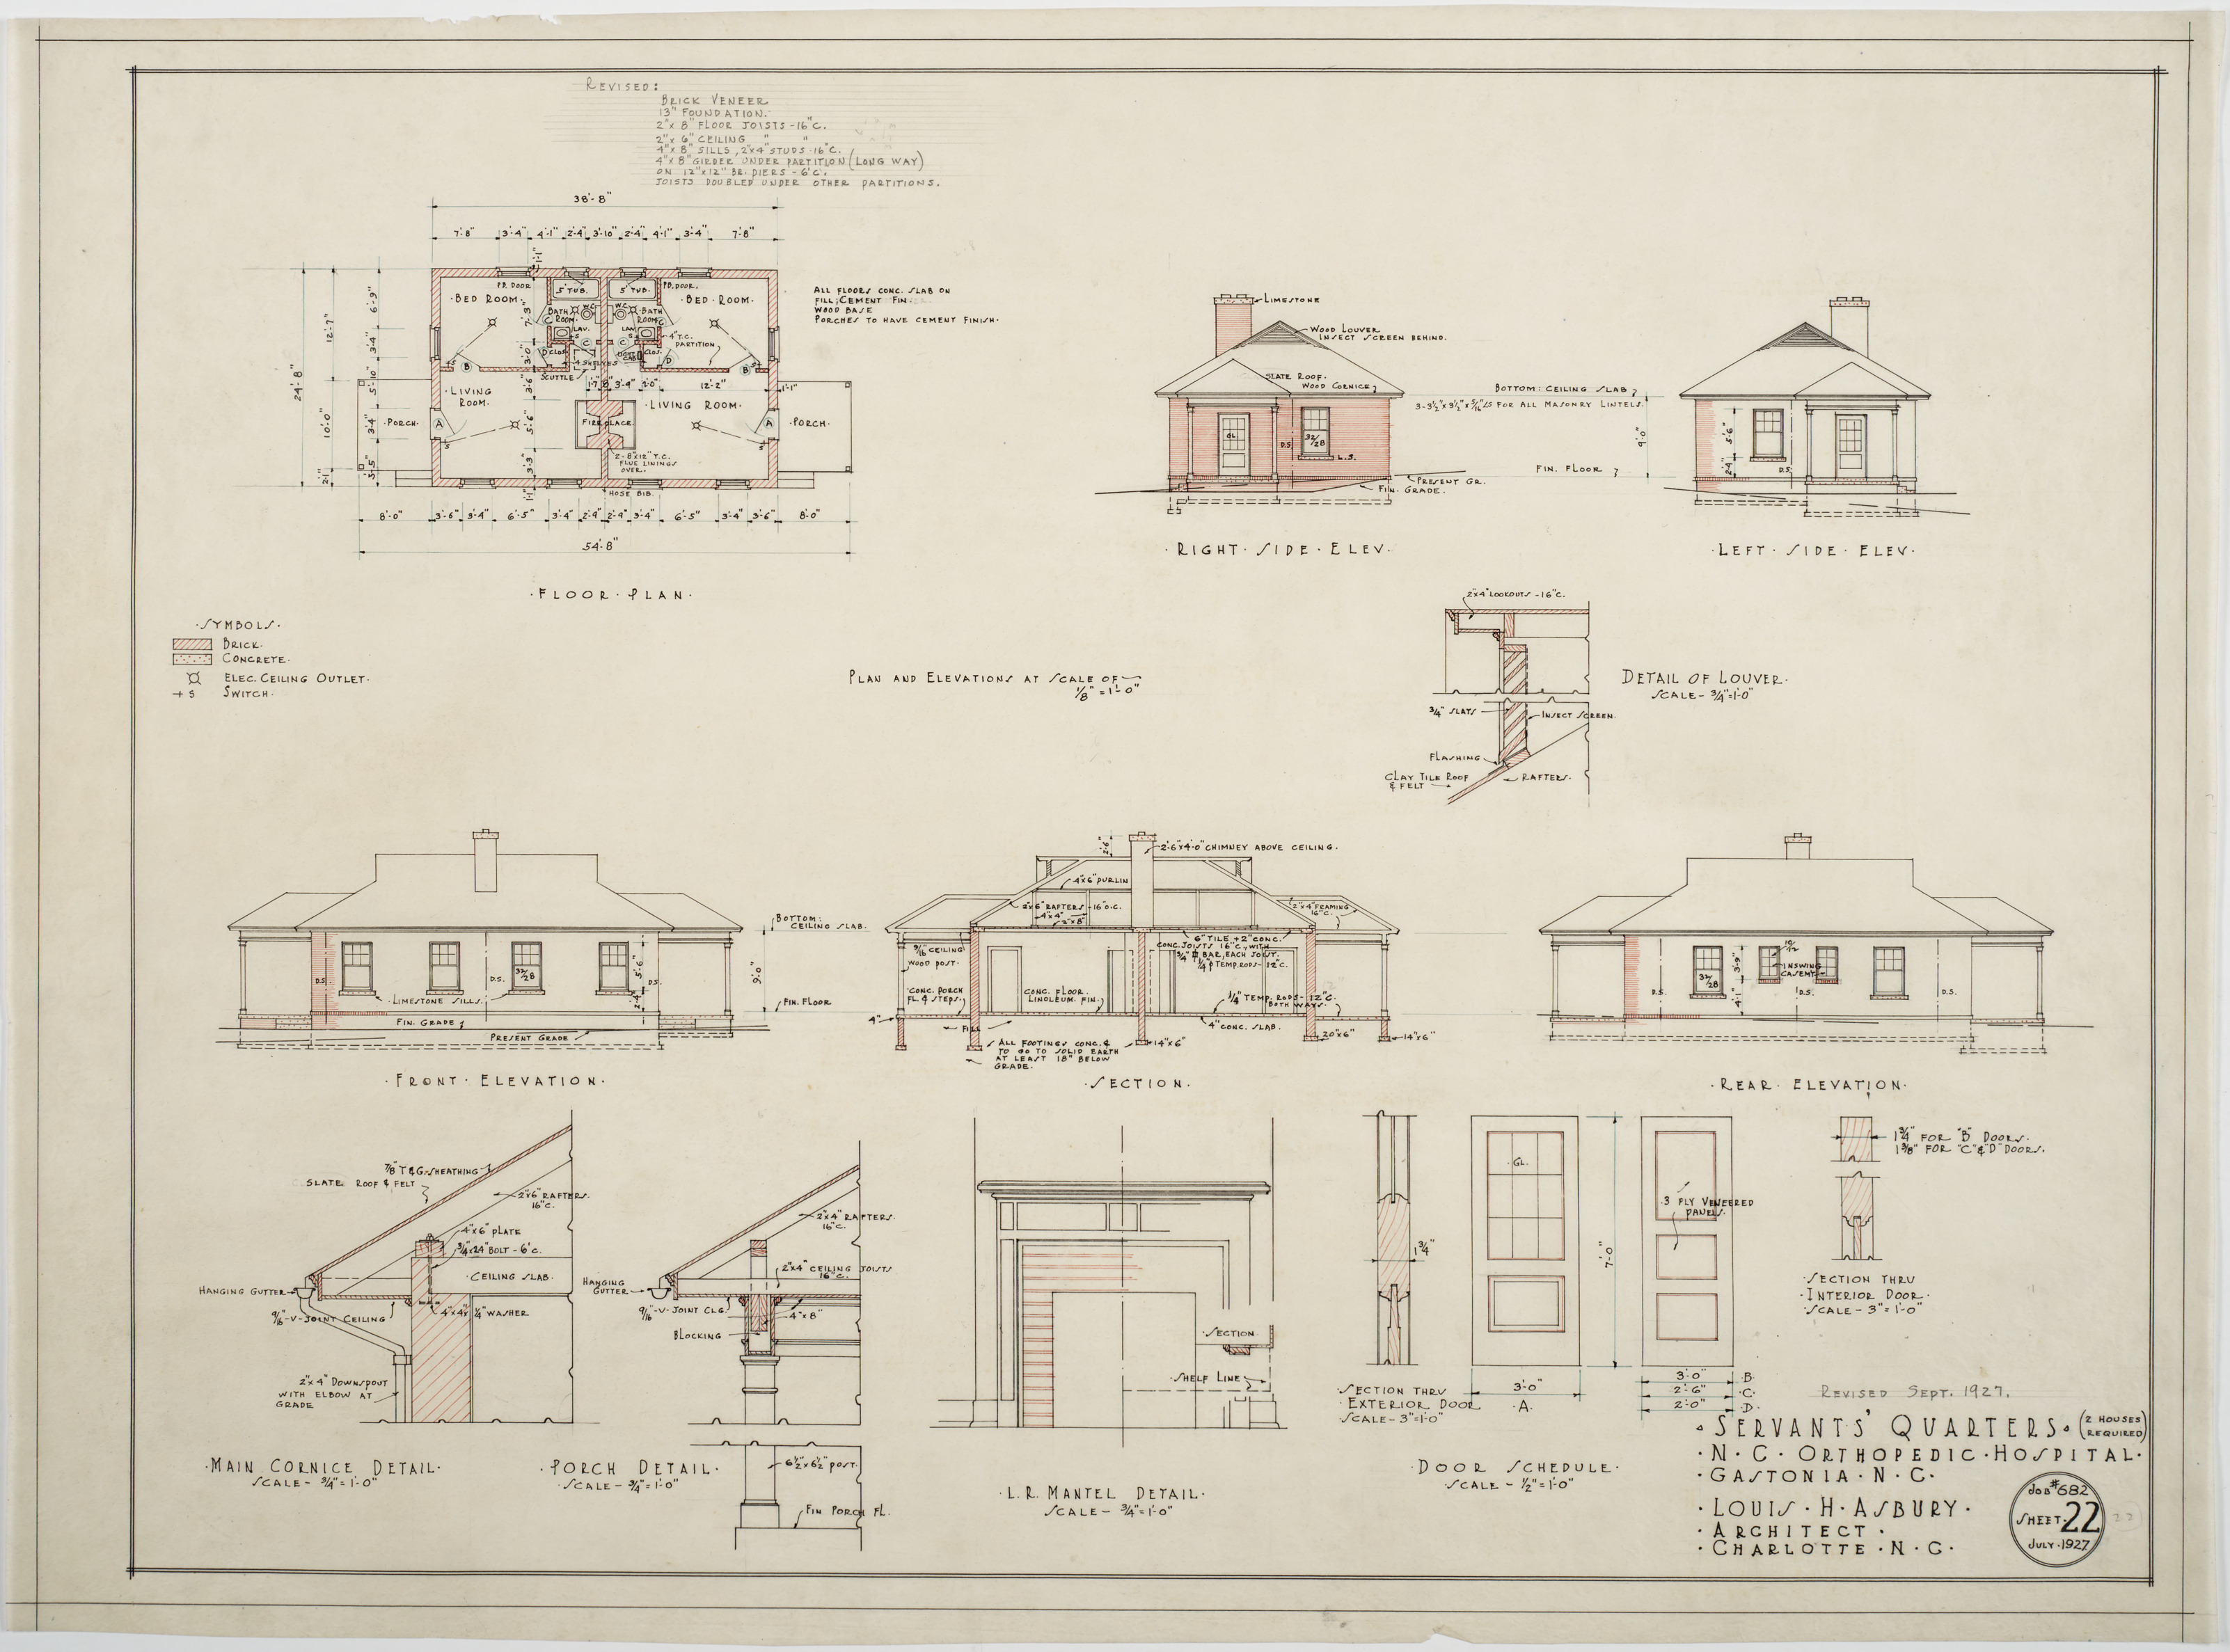 Plan Elevation Section Of Hospital : Floor plan elevations section of servants quarters